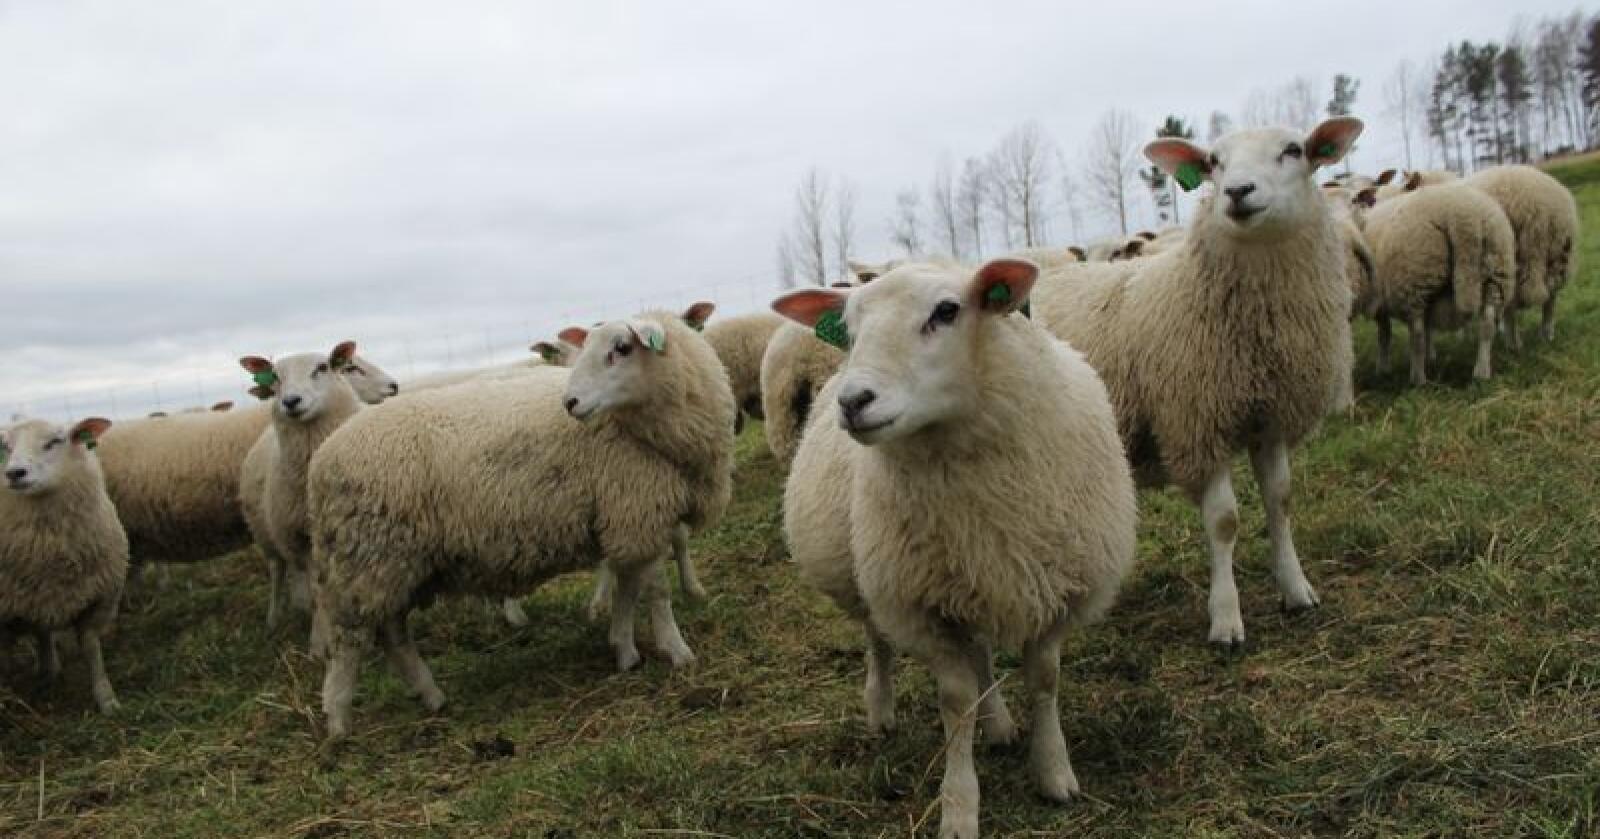 Lam på høstbeite på Tynset. Arkivfoto: Norsk Landbruk